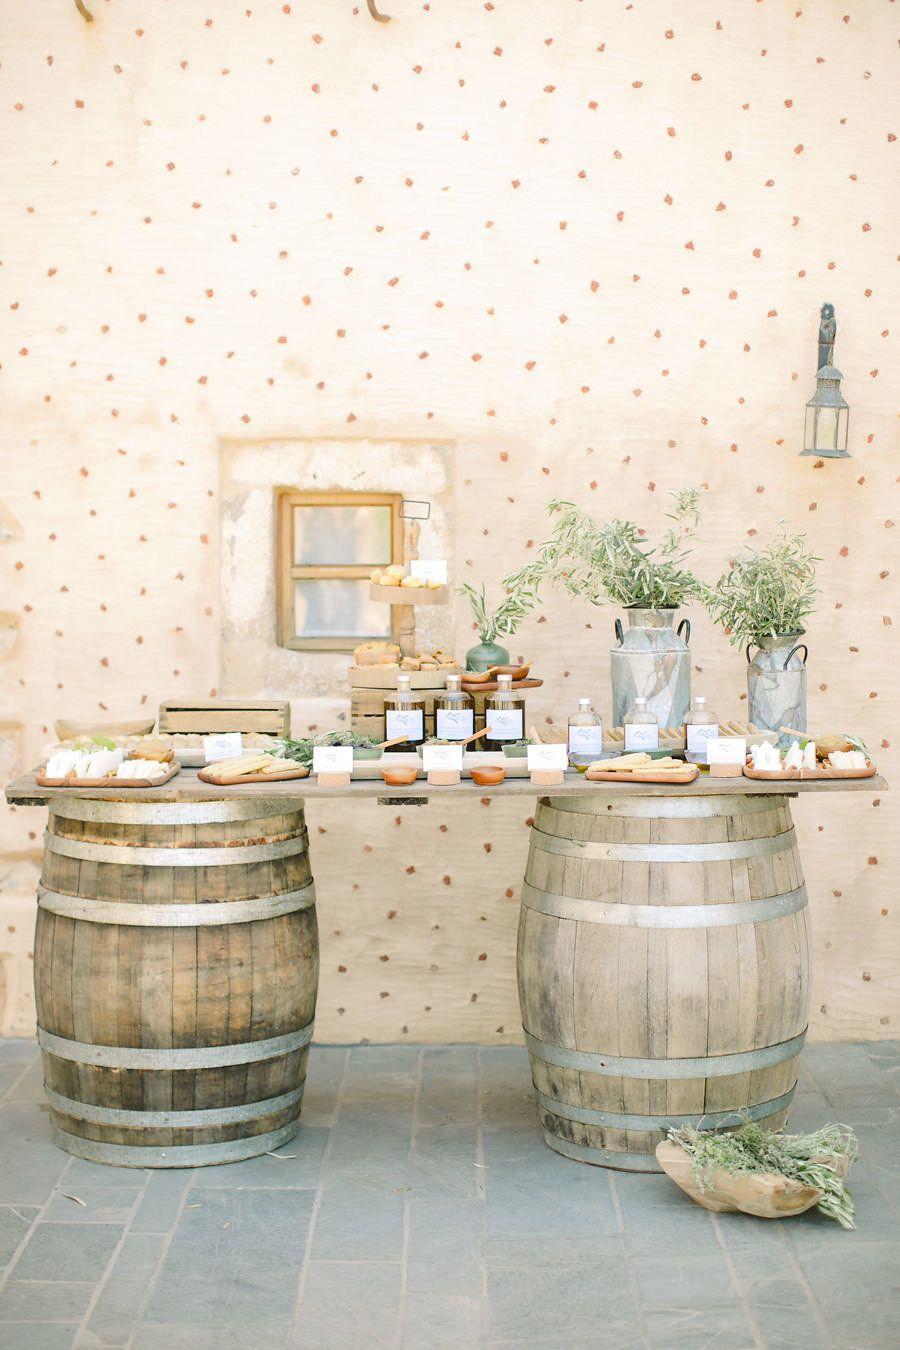 Culinary themed wedding: Photography: Anna Roussos - http://www.annaroussos.com/